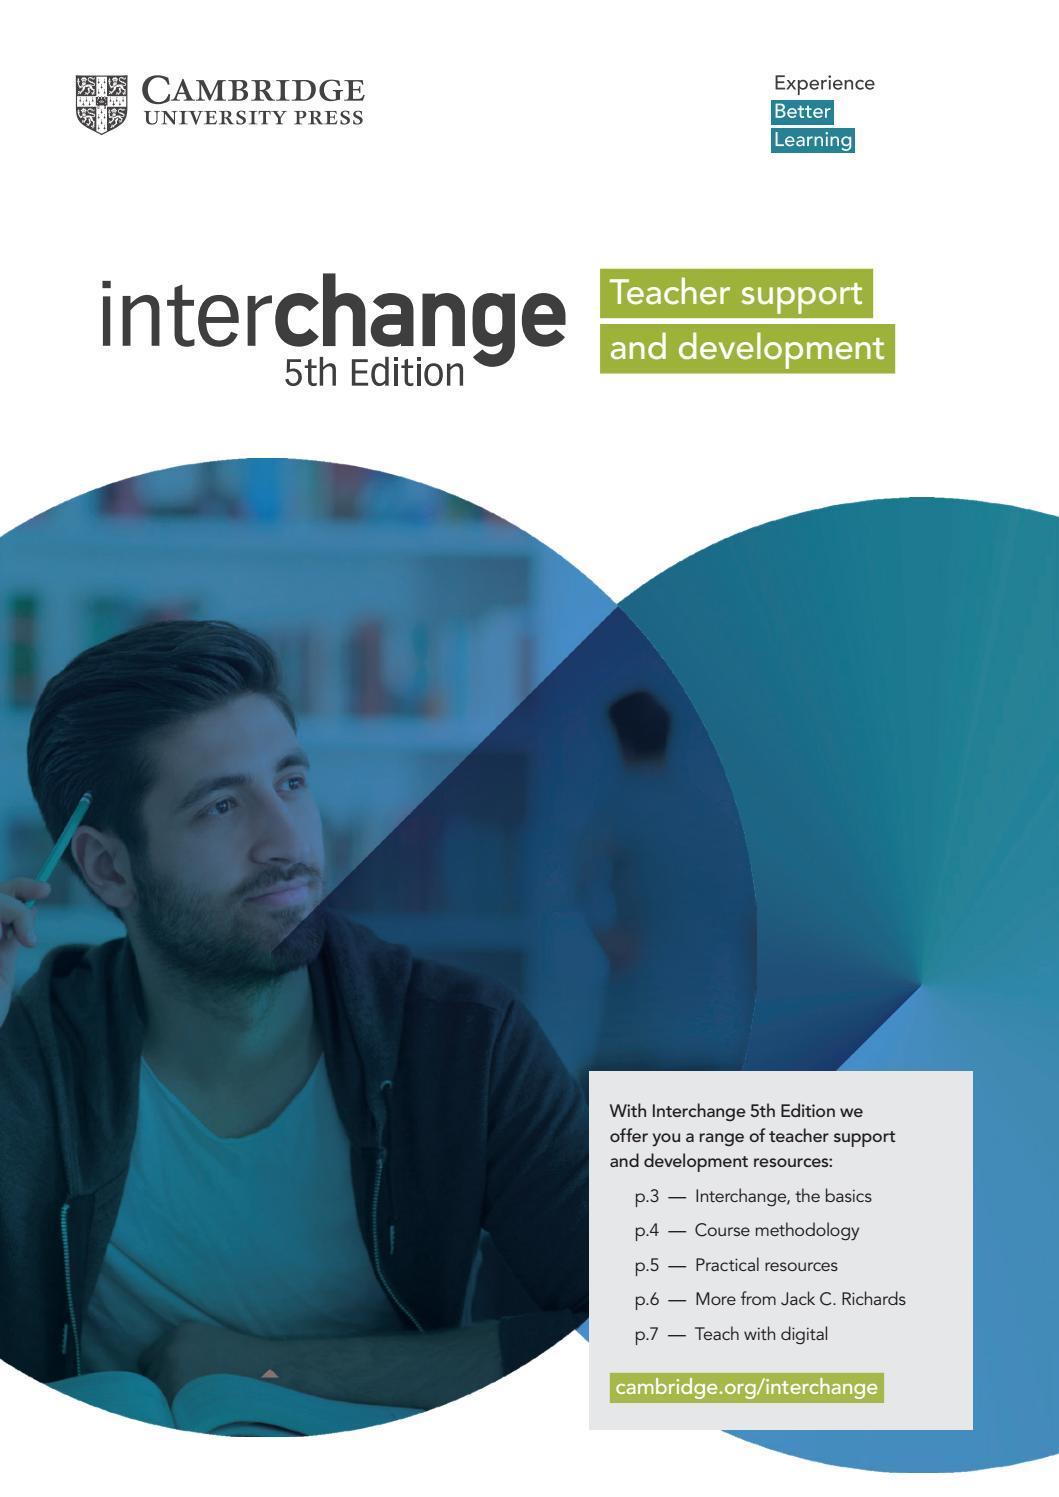 Interchange 5th Edition - Teacher support and development by